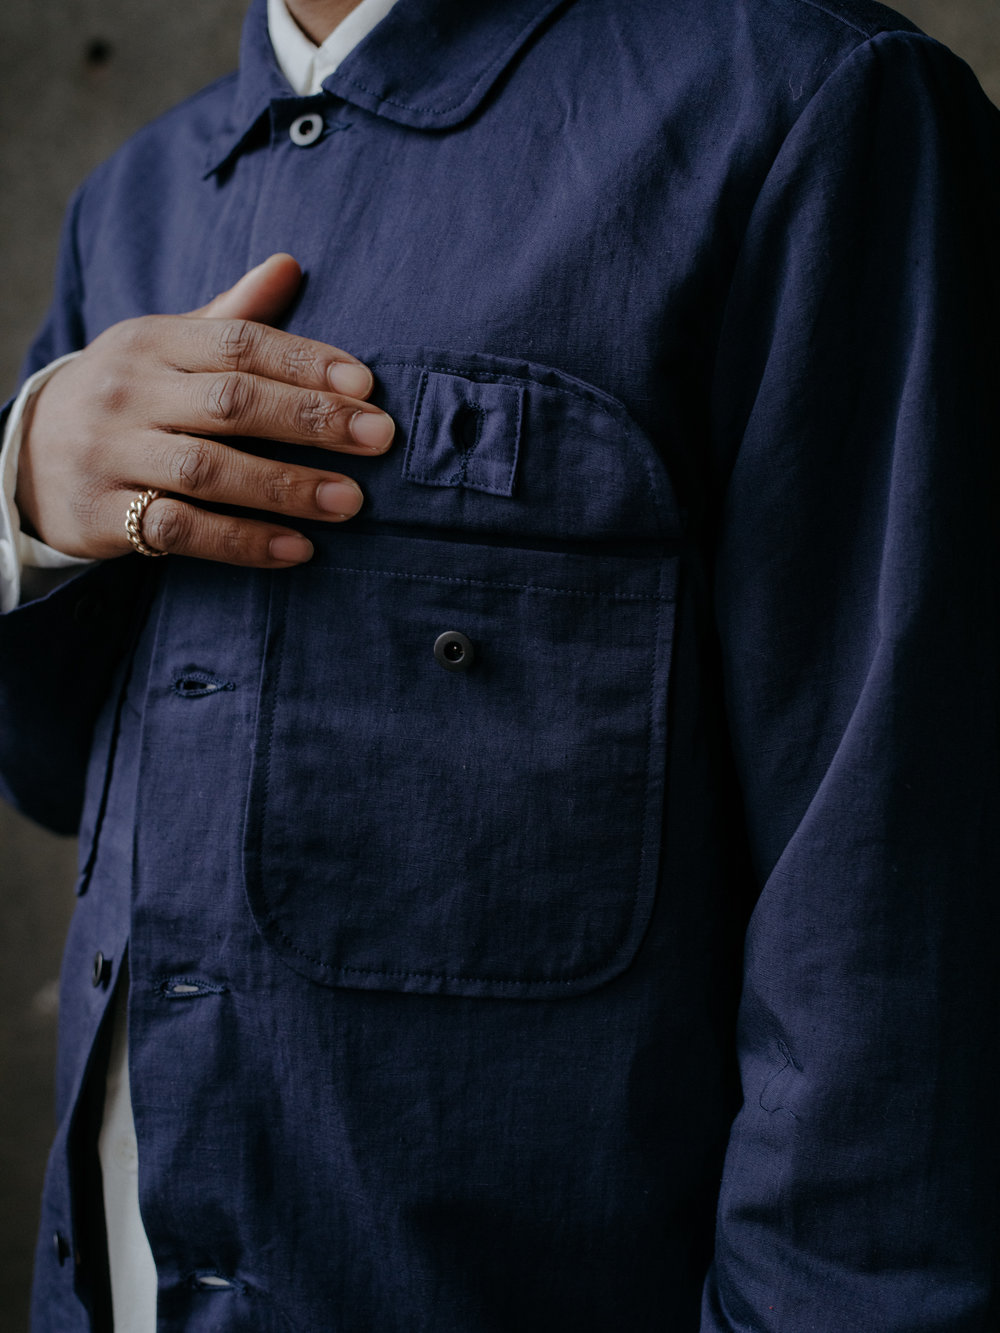 evan-kinori-field-shirt-nylon-linen-7